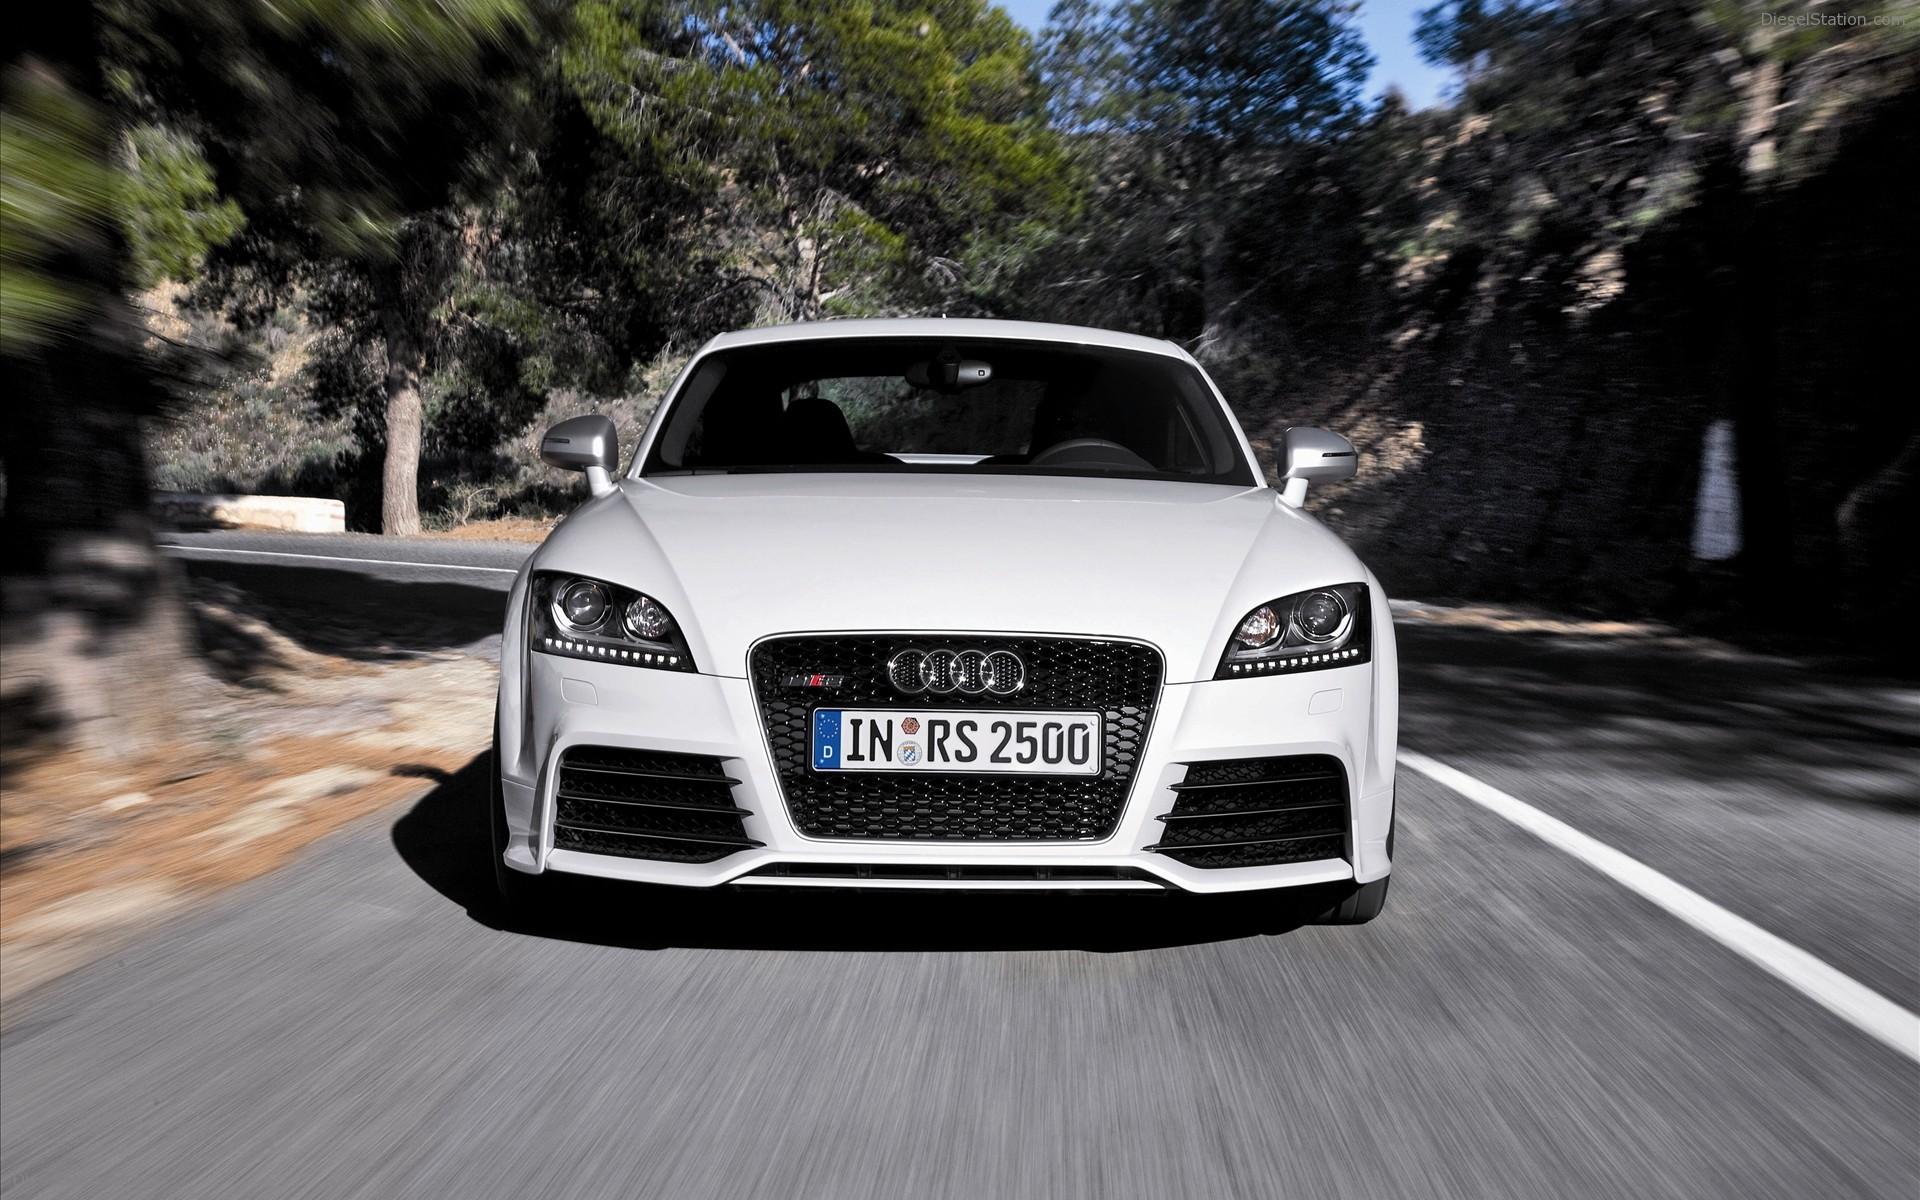 Audi TT RS Wallpapers HD Download 1920x1200